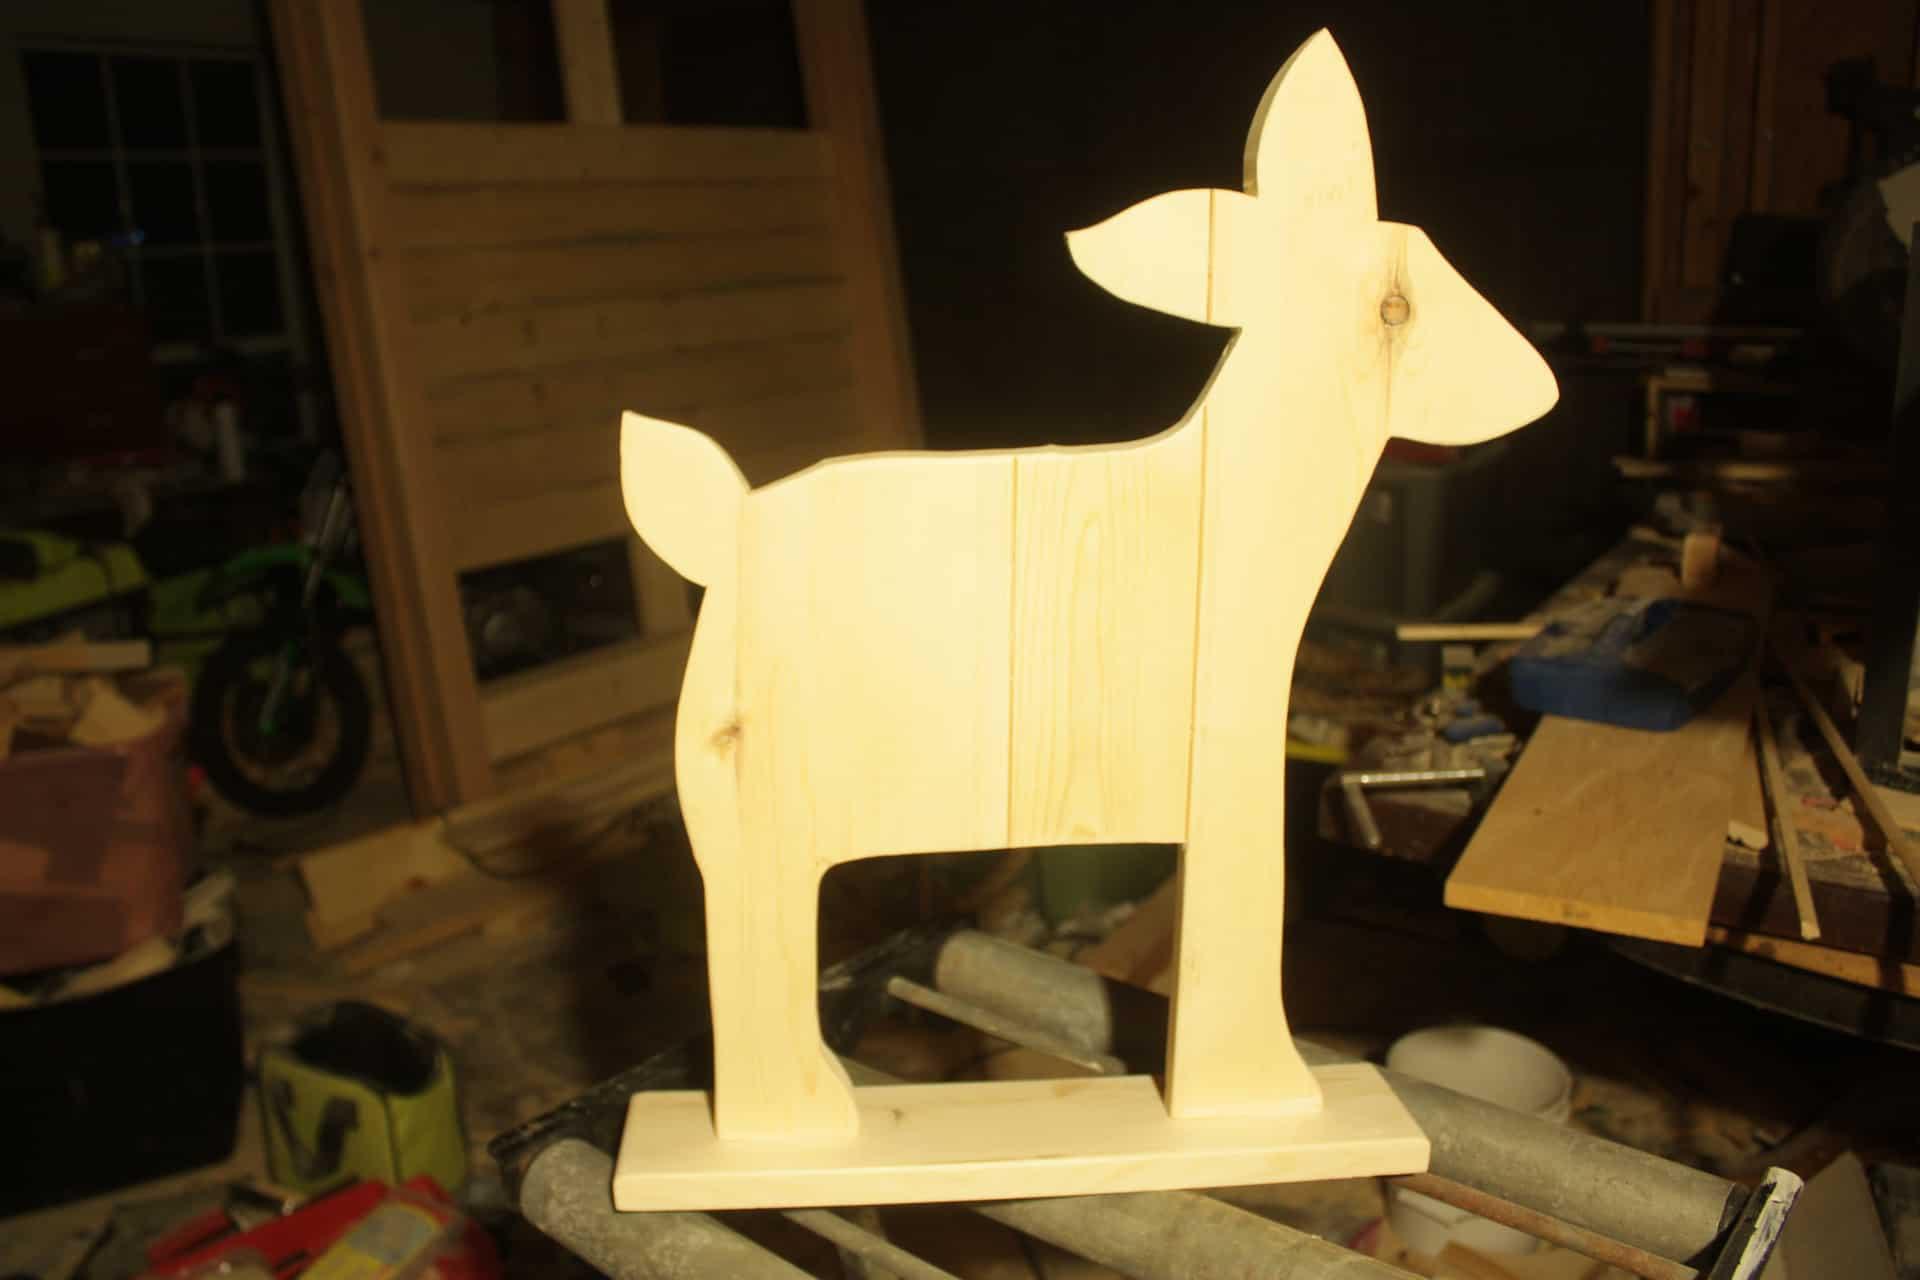 Building the DIY wood deer decor